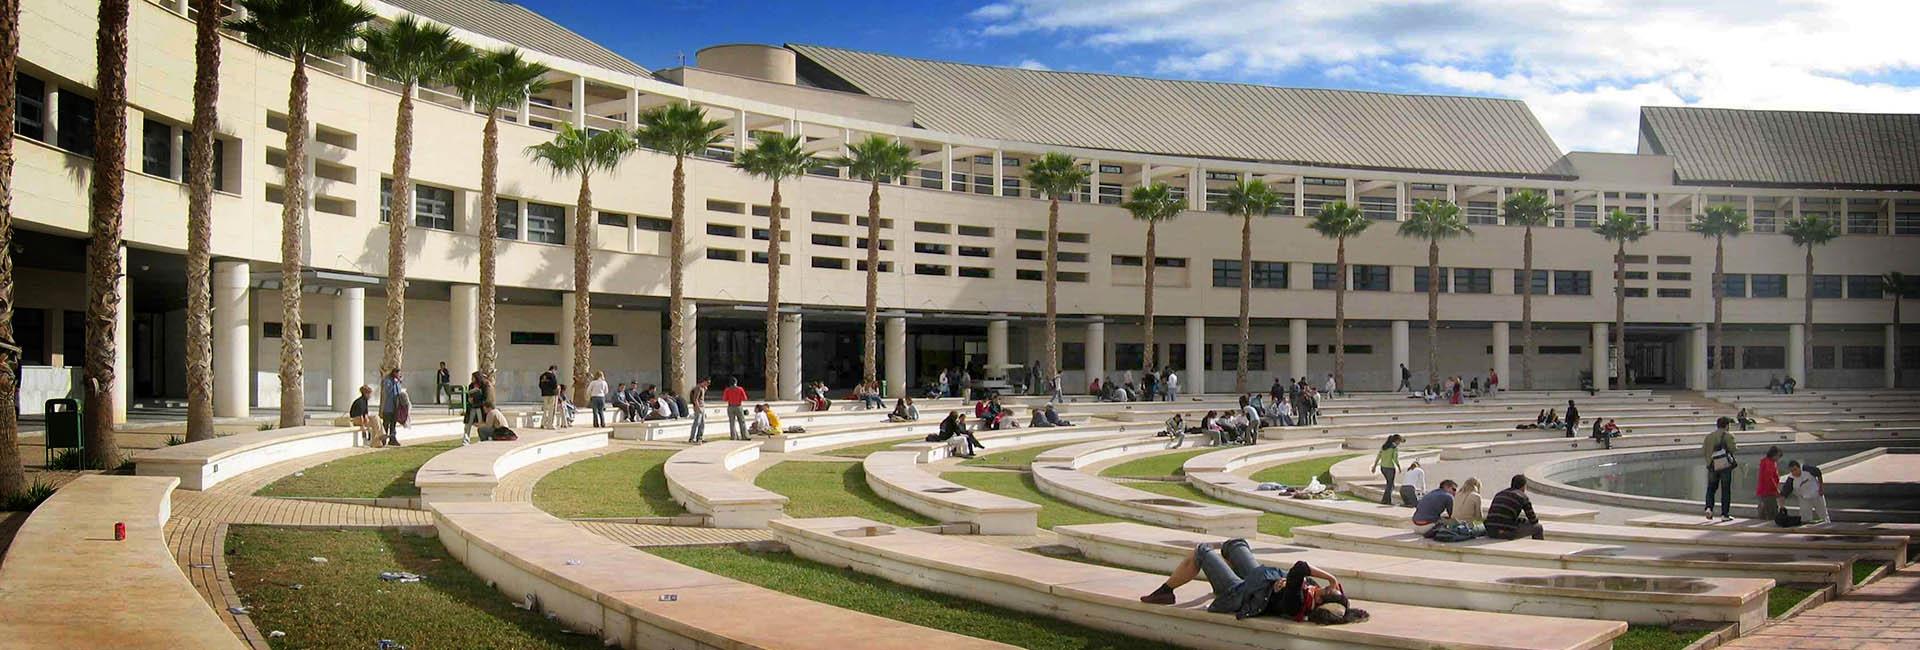 alicante-university